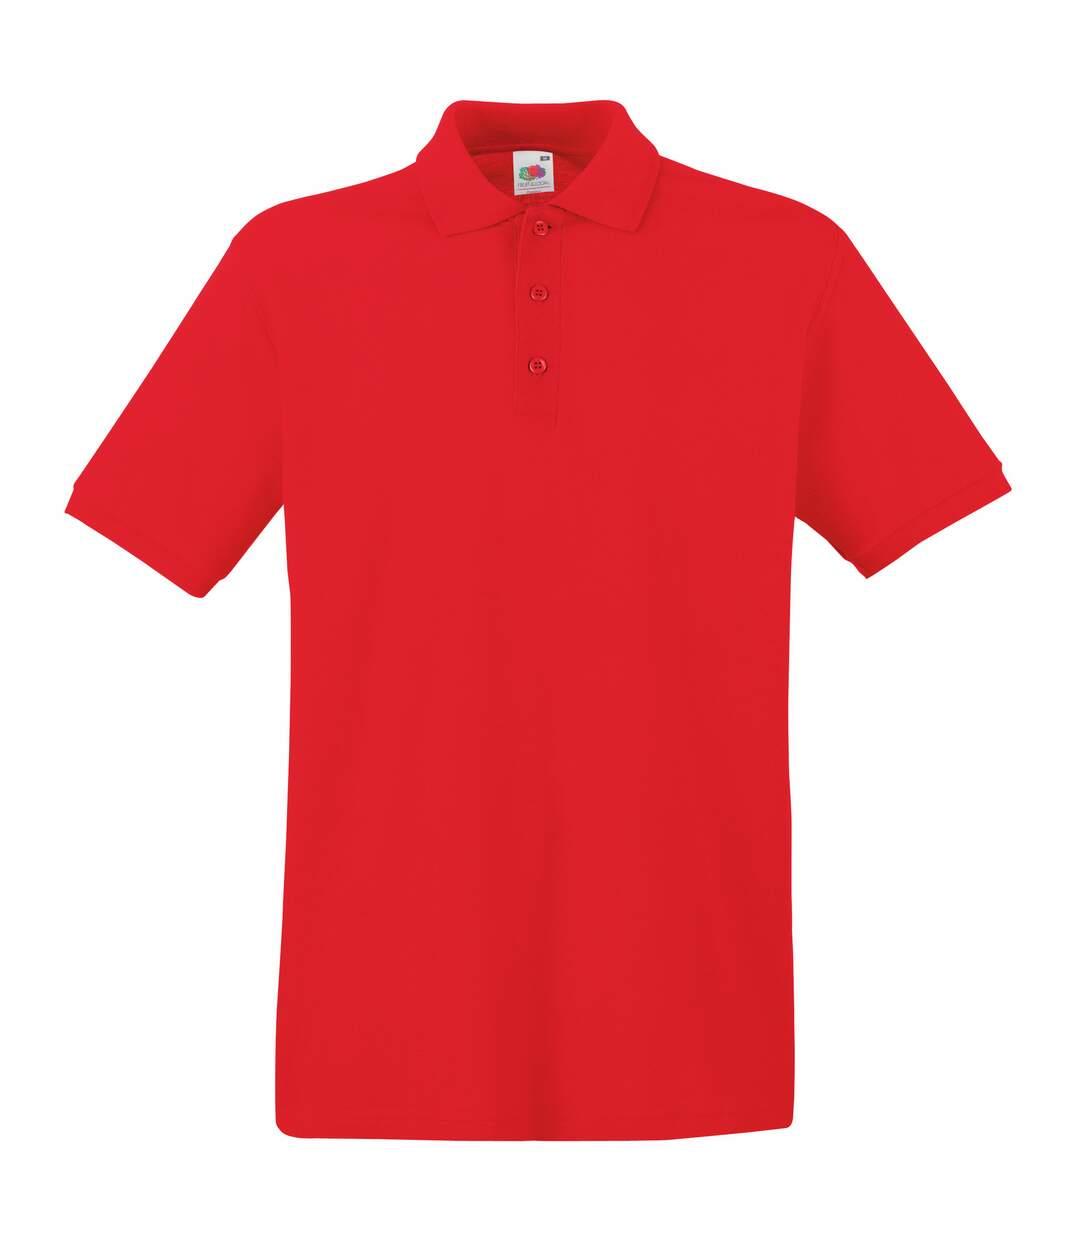 Fruit Of The Loom Premium Mens Short Sleeve Polo Shirt (Burgundy) - UTBC1381